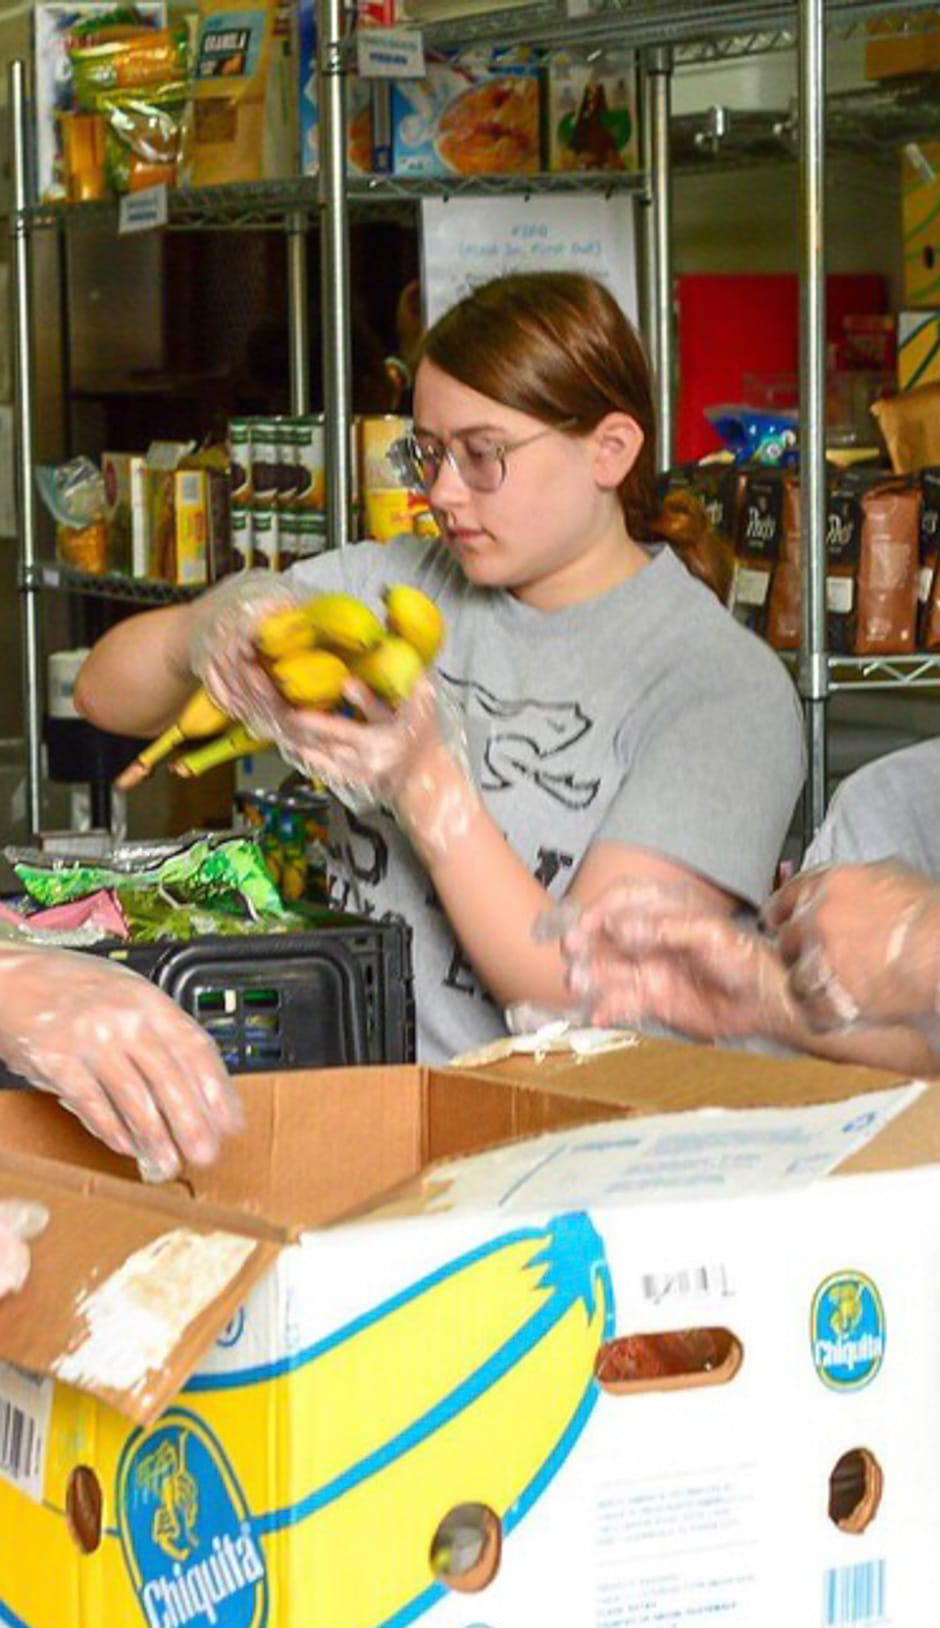 Girl sorting bananas and volunteering at a food bank for community service program